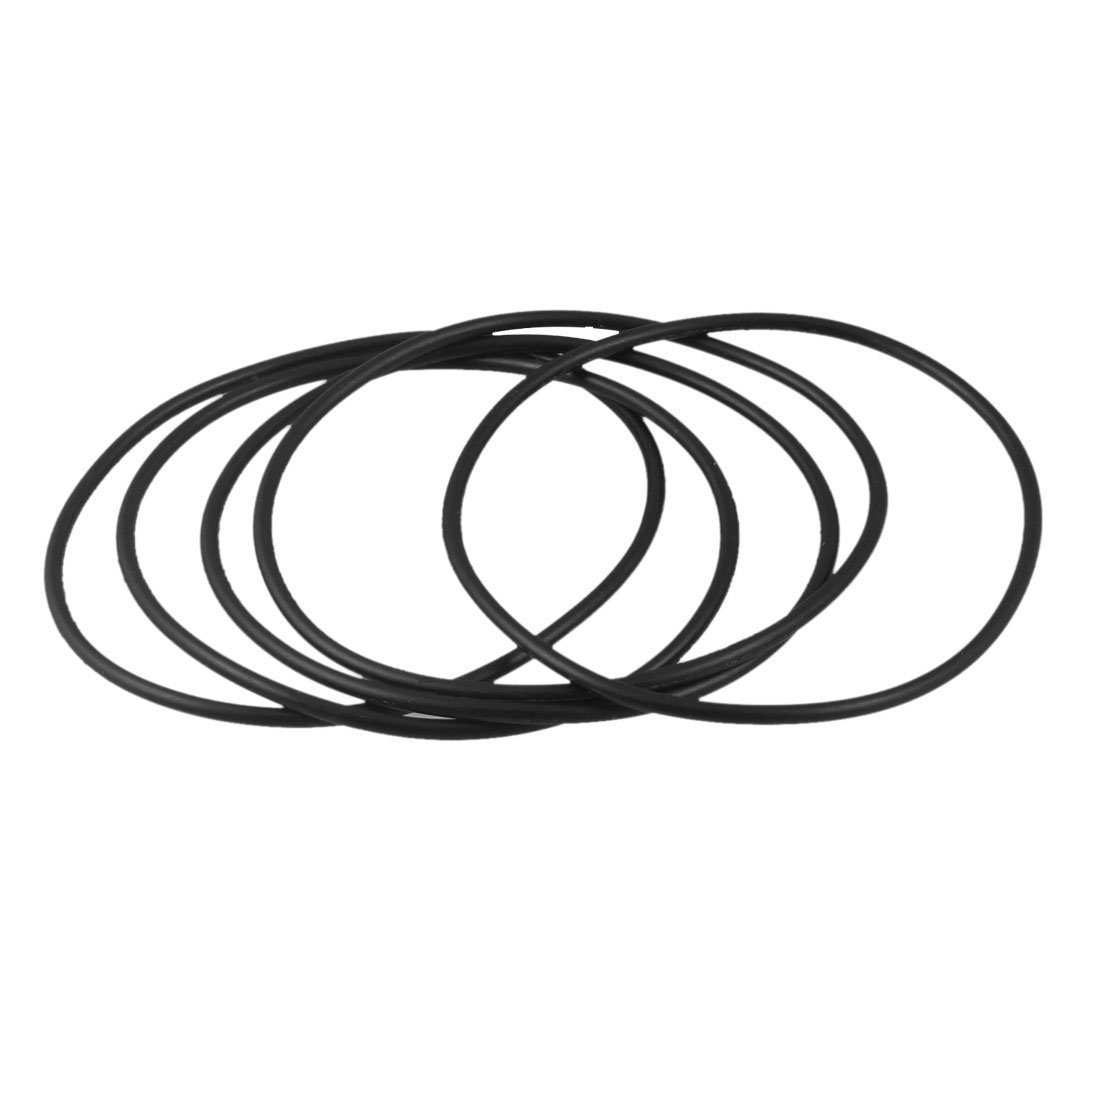 75 mm x 2,65 mm x 69,7 mm Industrial Rubber O Ring Oil Seal Dichtungen 5 St/ück